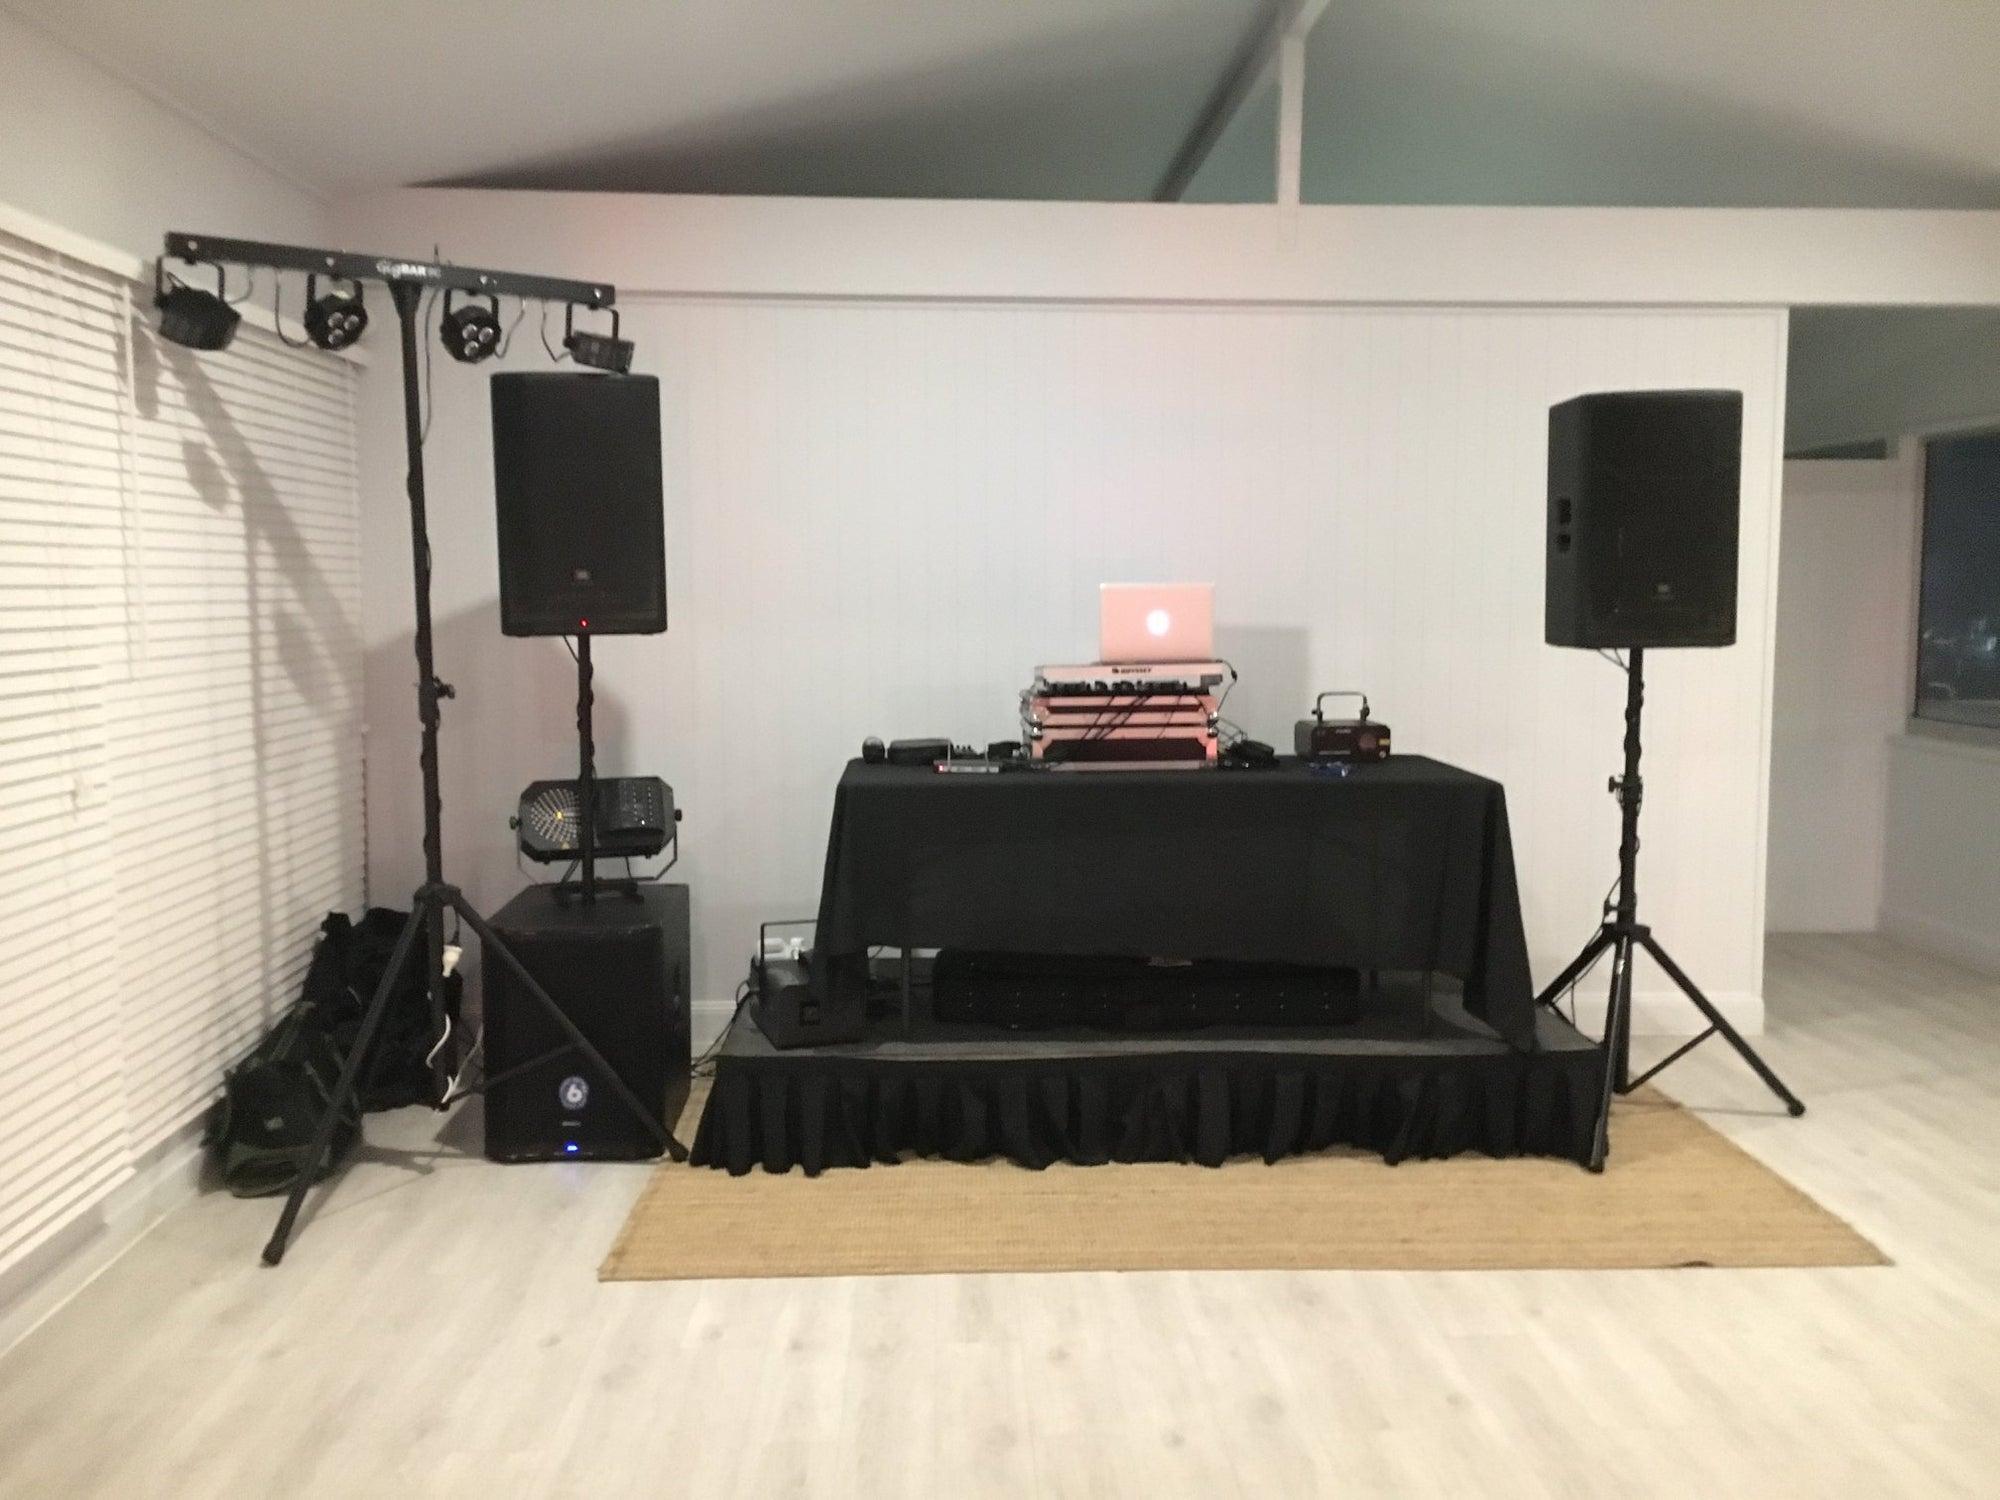 Pier 33 Mooloolaba DJ Setup